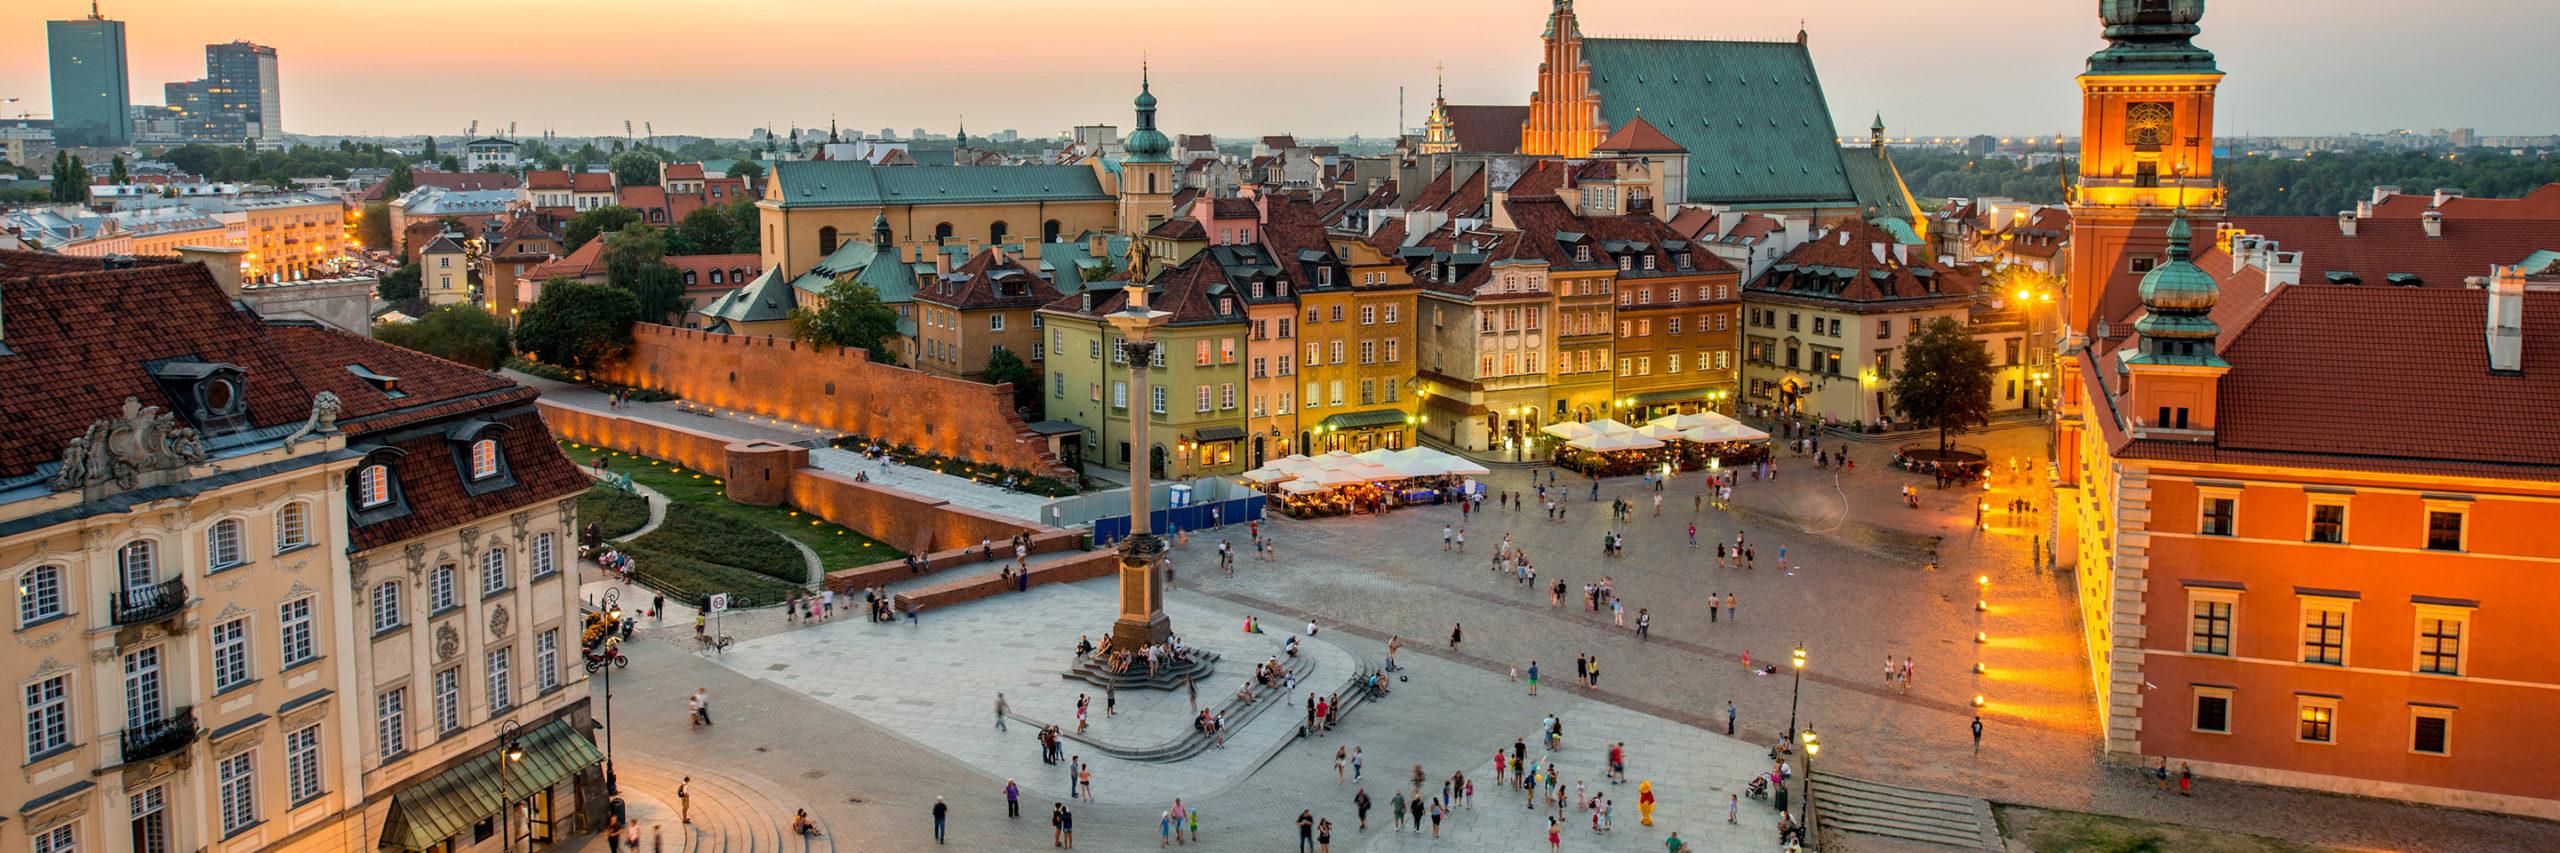 poland destination scaled Study in Poland